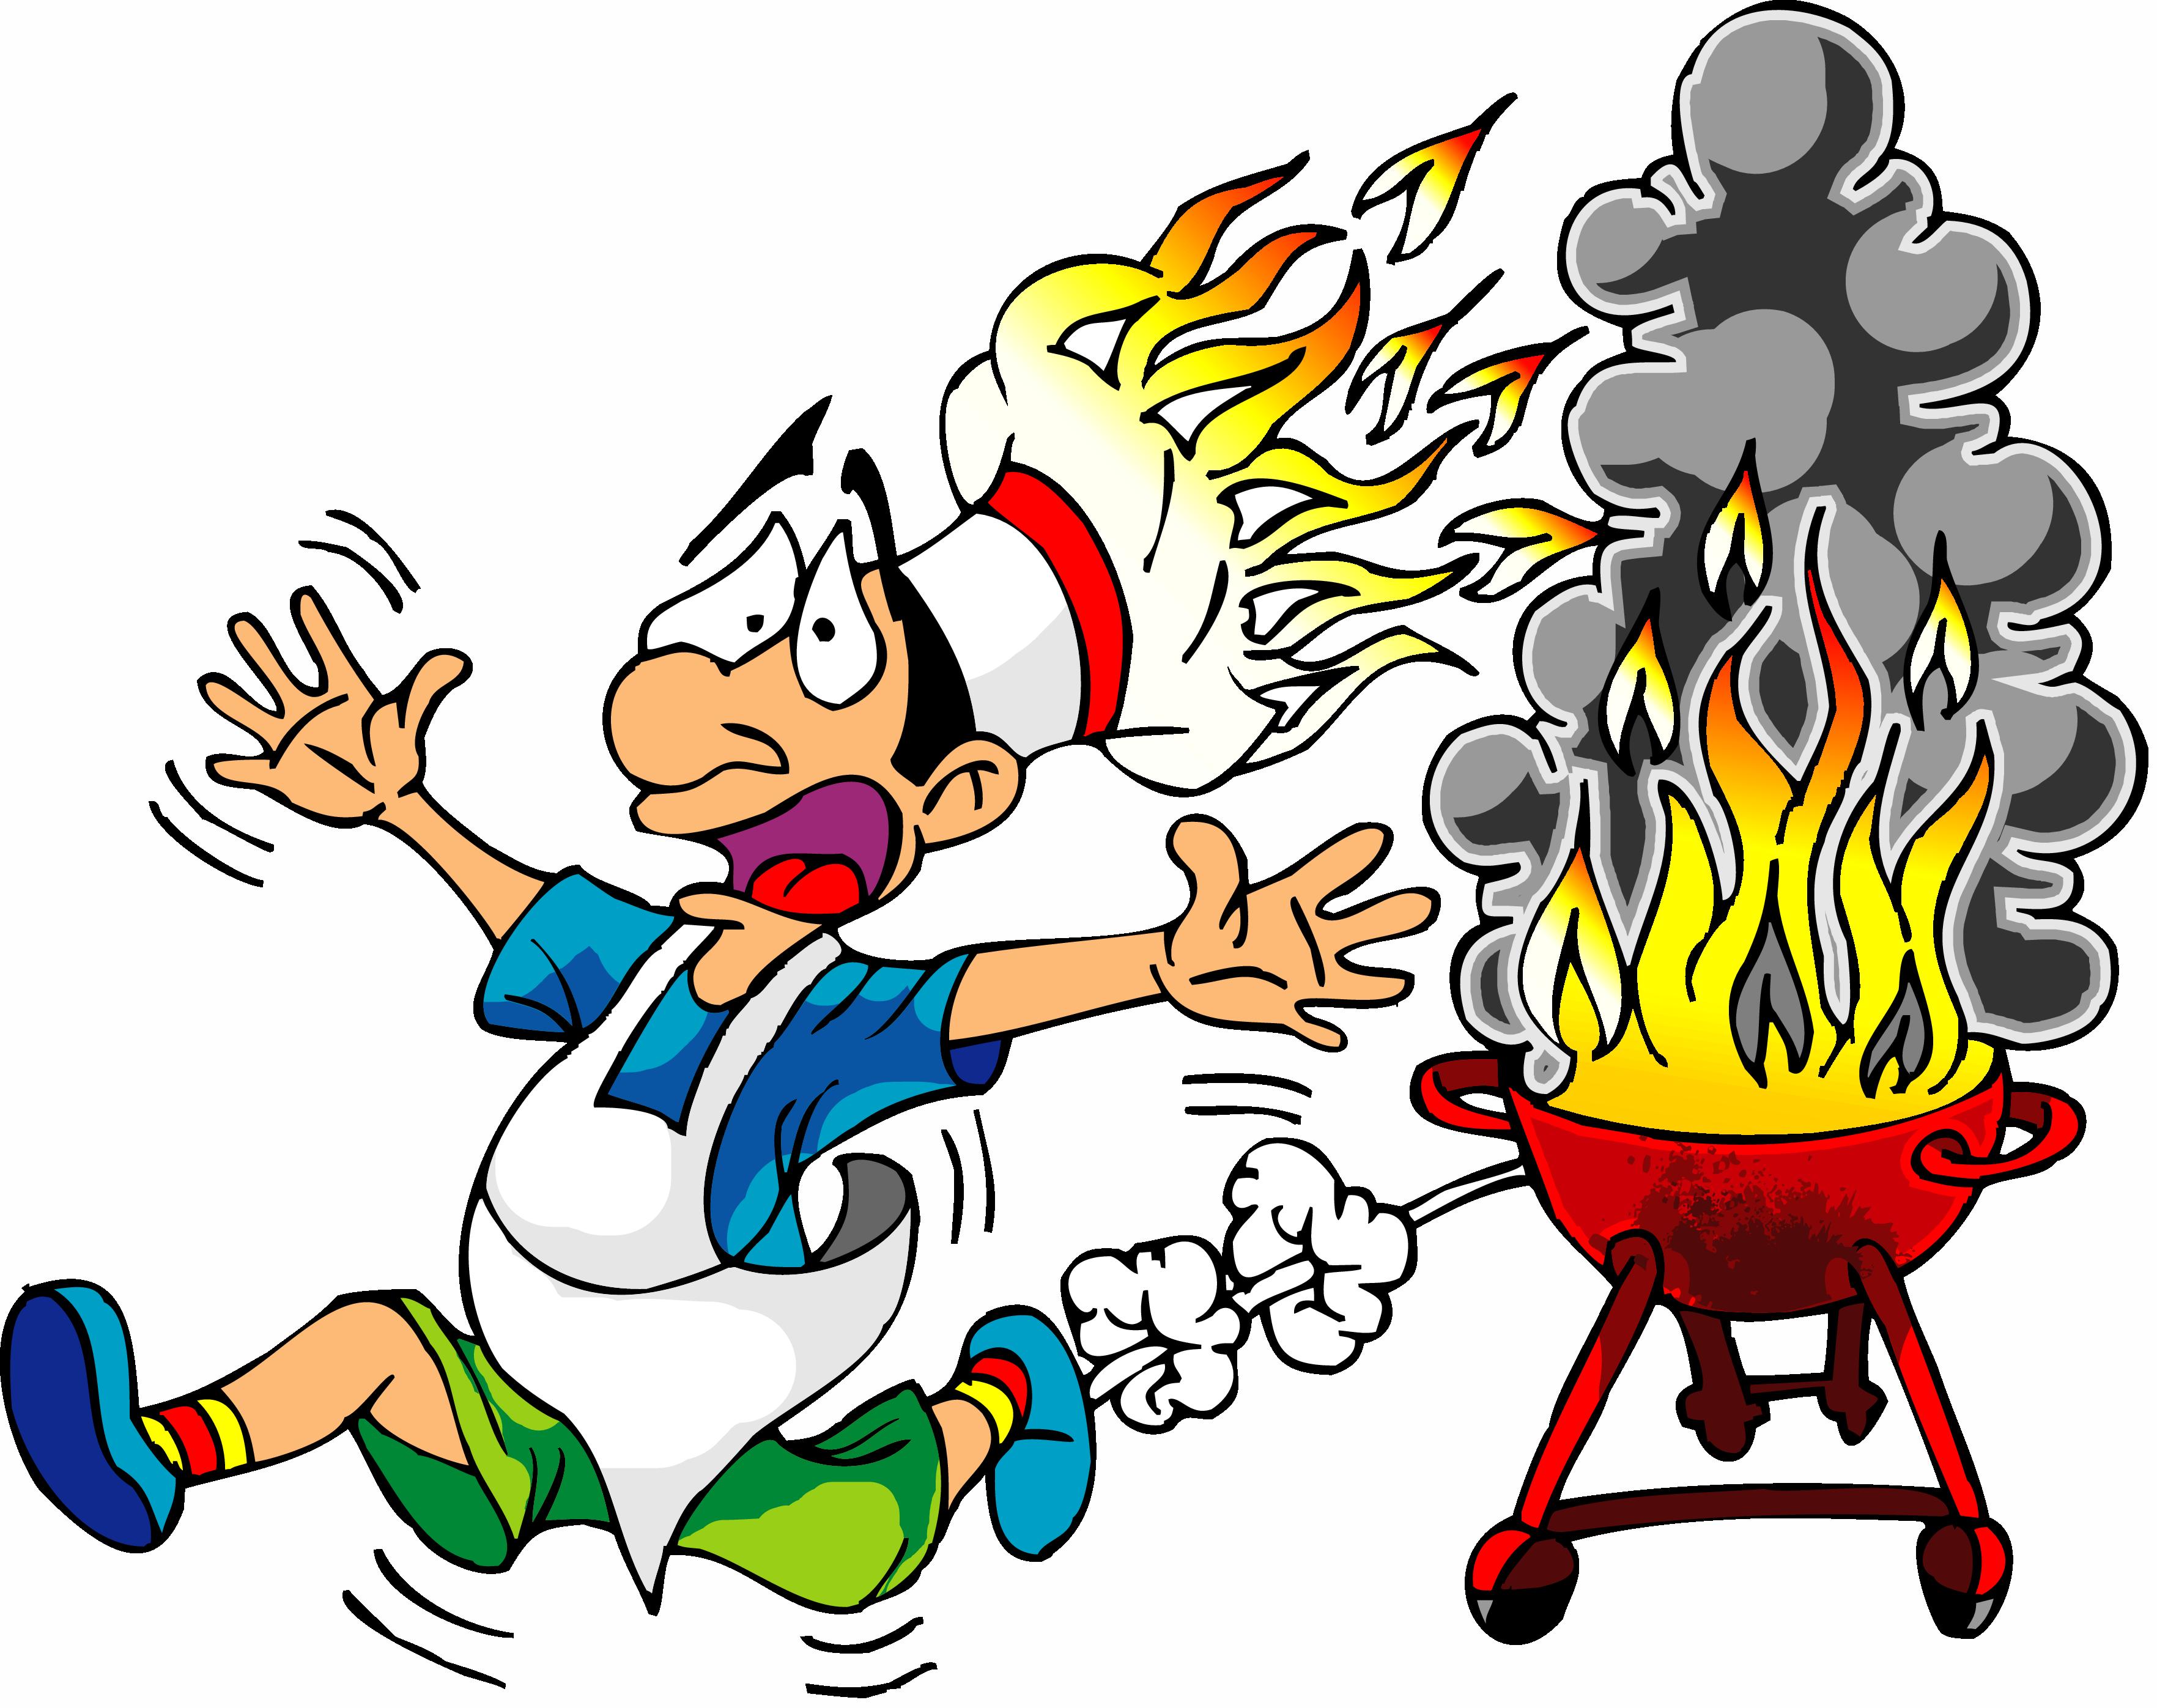 cook with fire hat funny clip art rh askideas com funny clipart for church bulletin funny clip art cartoon